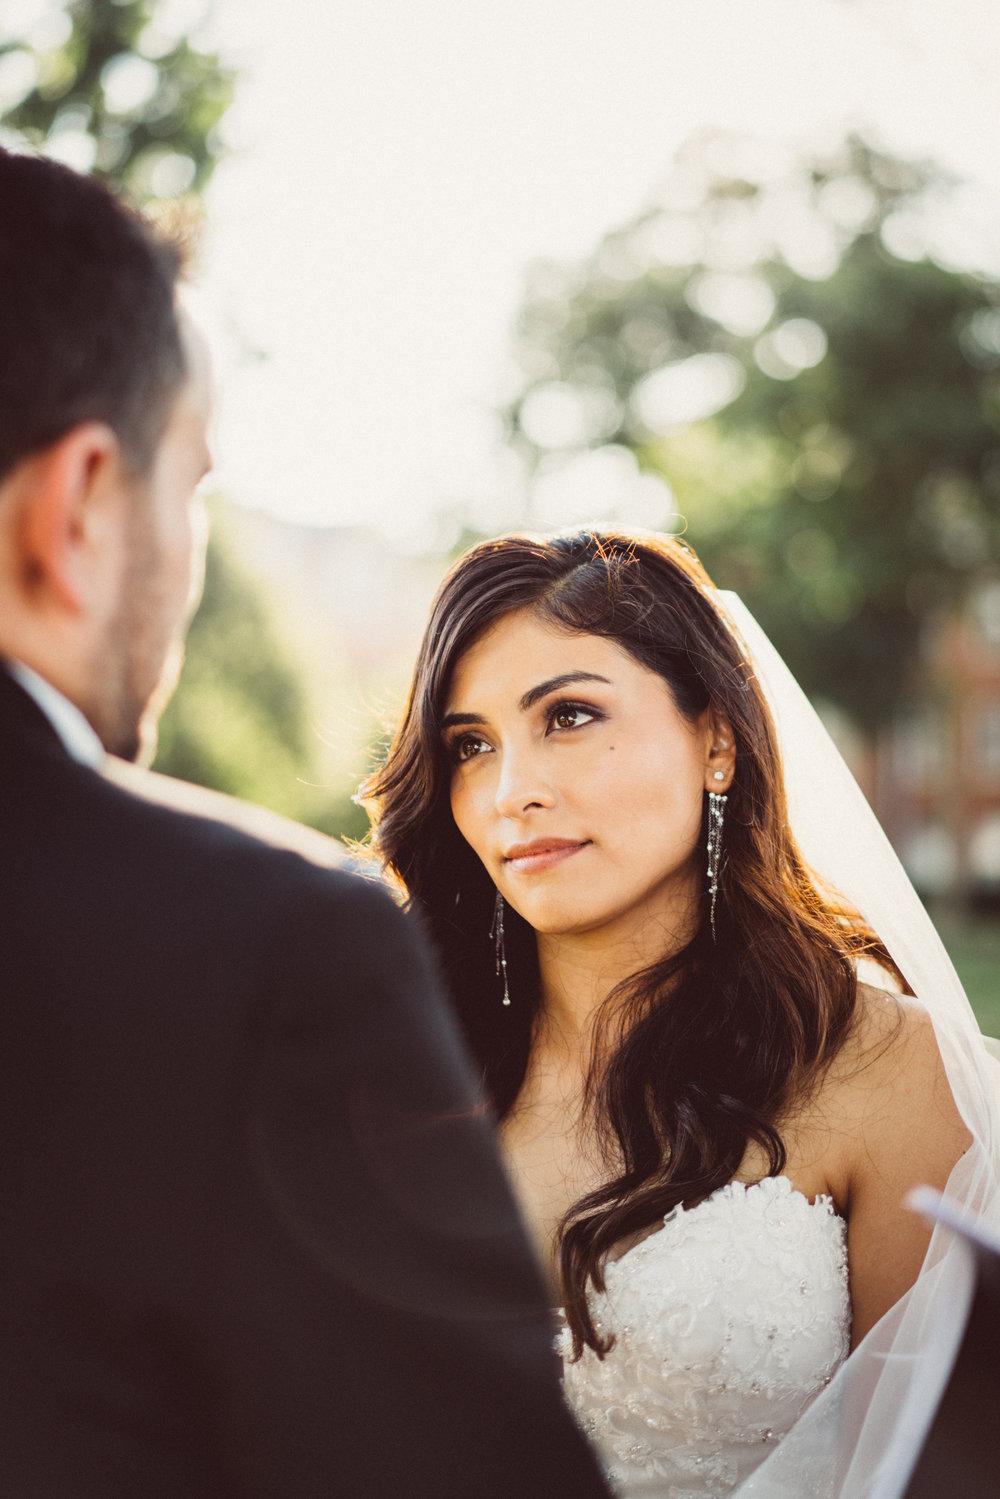 Mike_Steinmetz_Virginia_Wedding_Photographer_Favorites-26.jpg